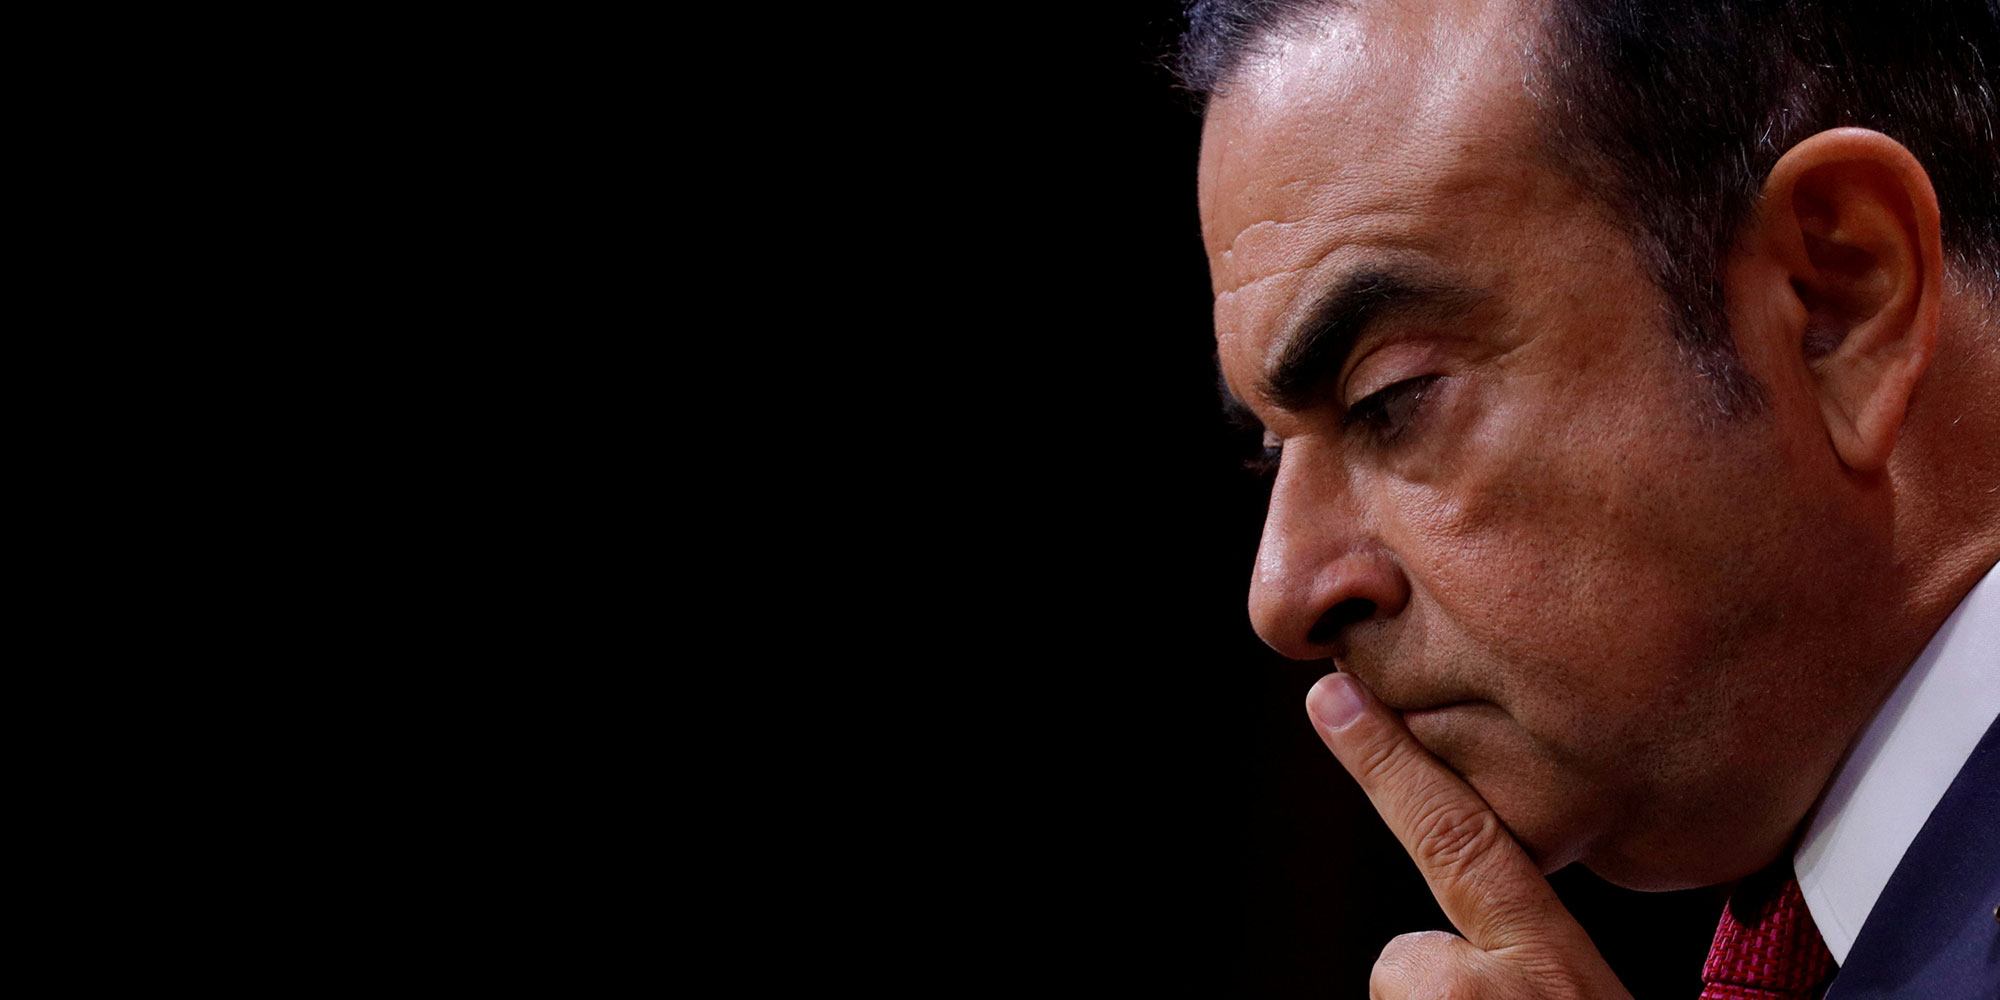 Carlos Ghosn mis en examen : voici ce que la justice japonaise lui reproche